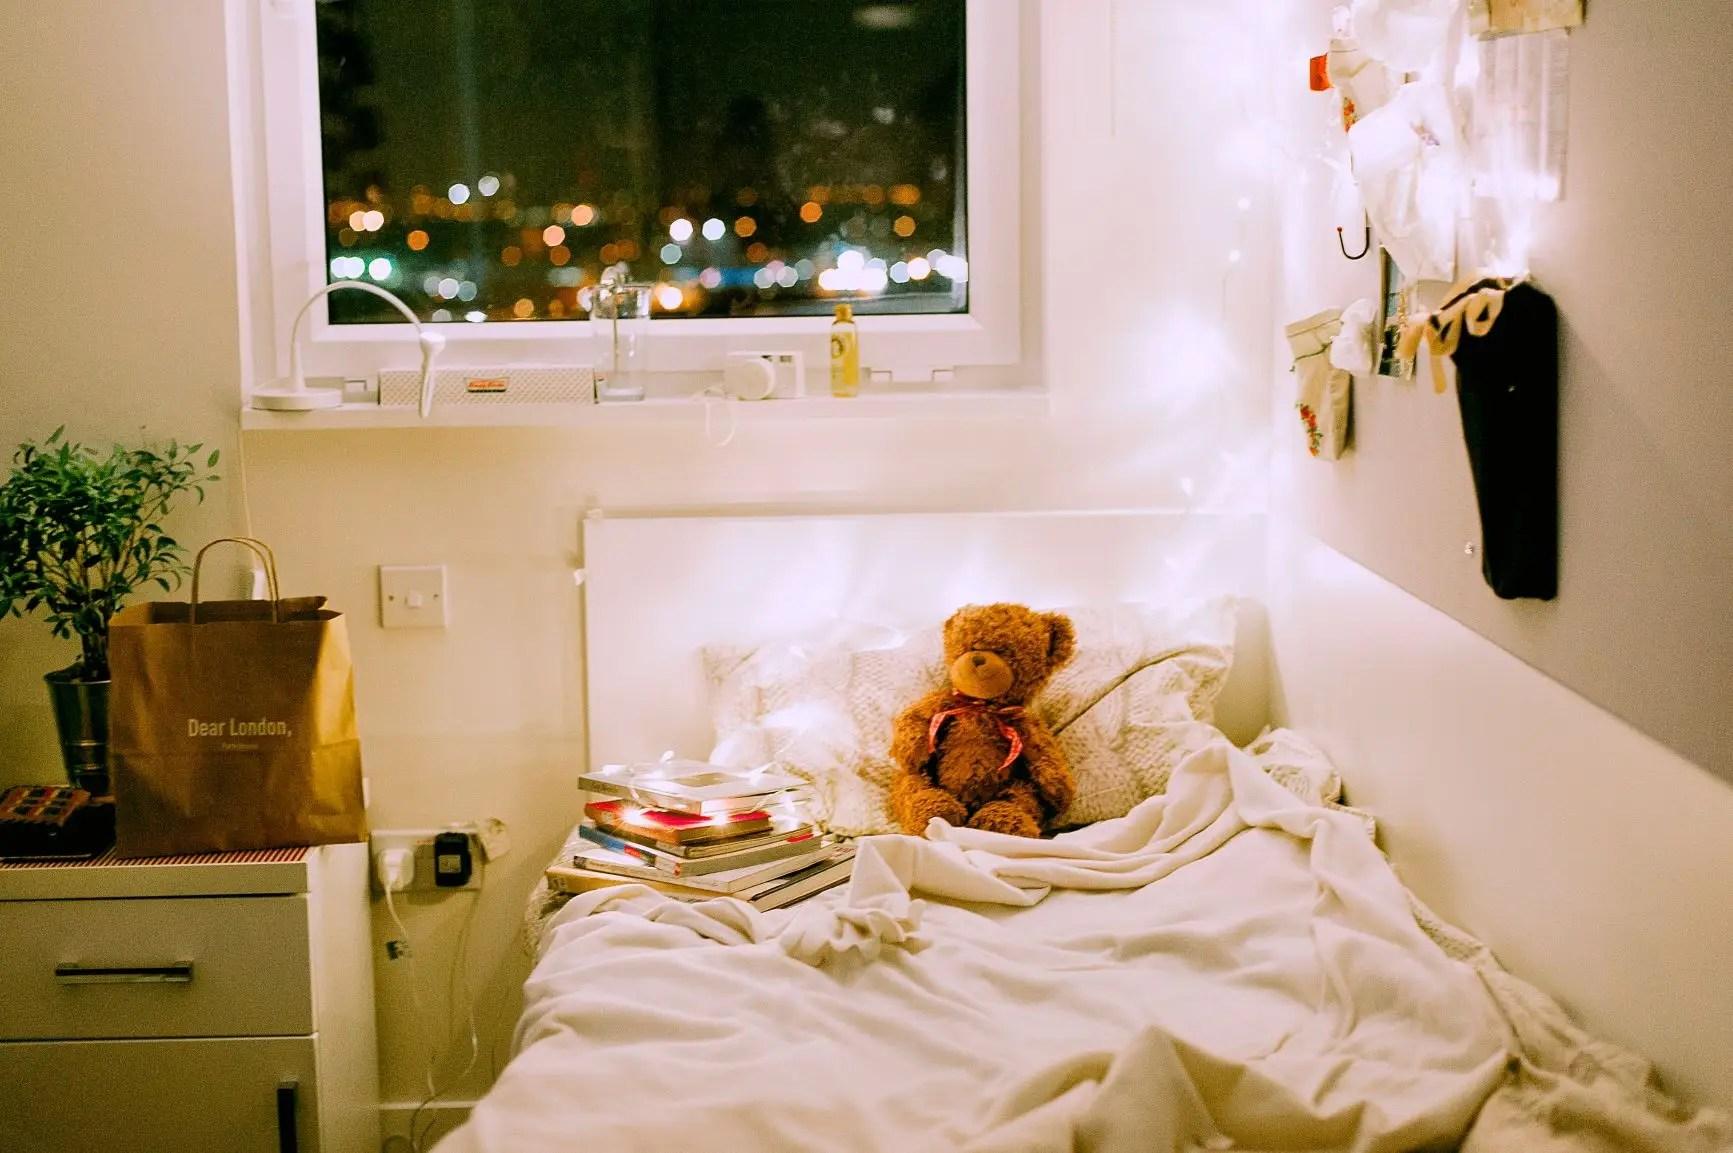 Childrens bedroom sanisnooze waterproof incontinence mattress bed